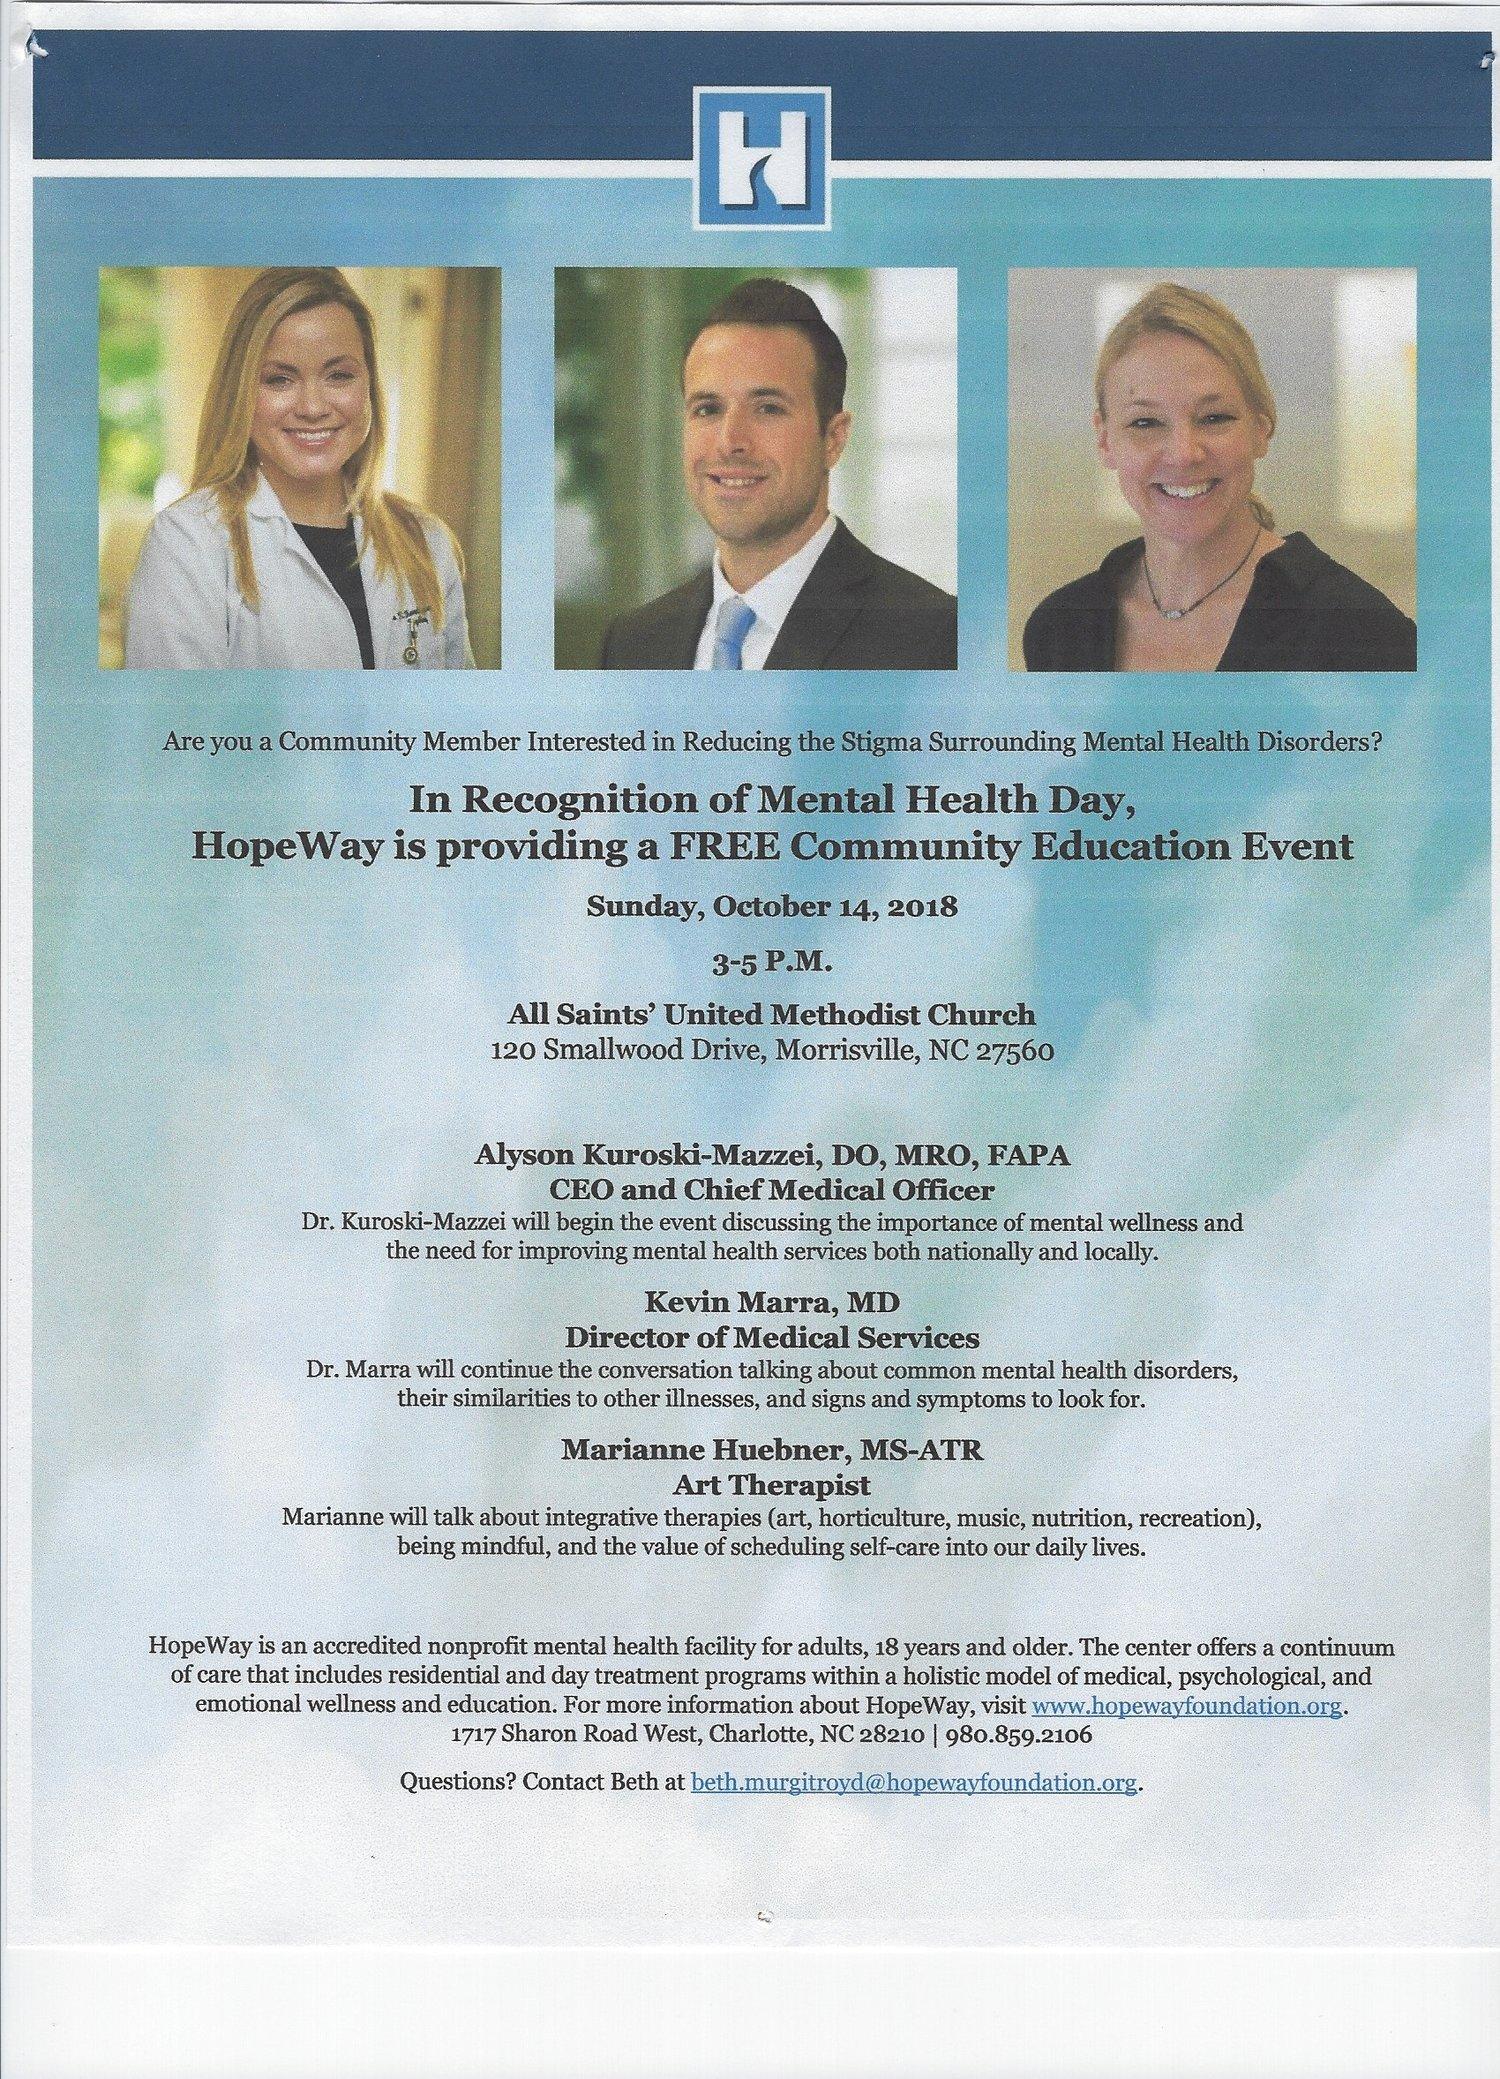 Making Hope Tangible: Mental Health Symposium — All Saints